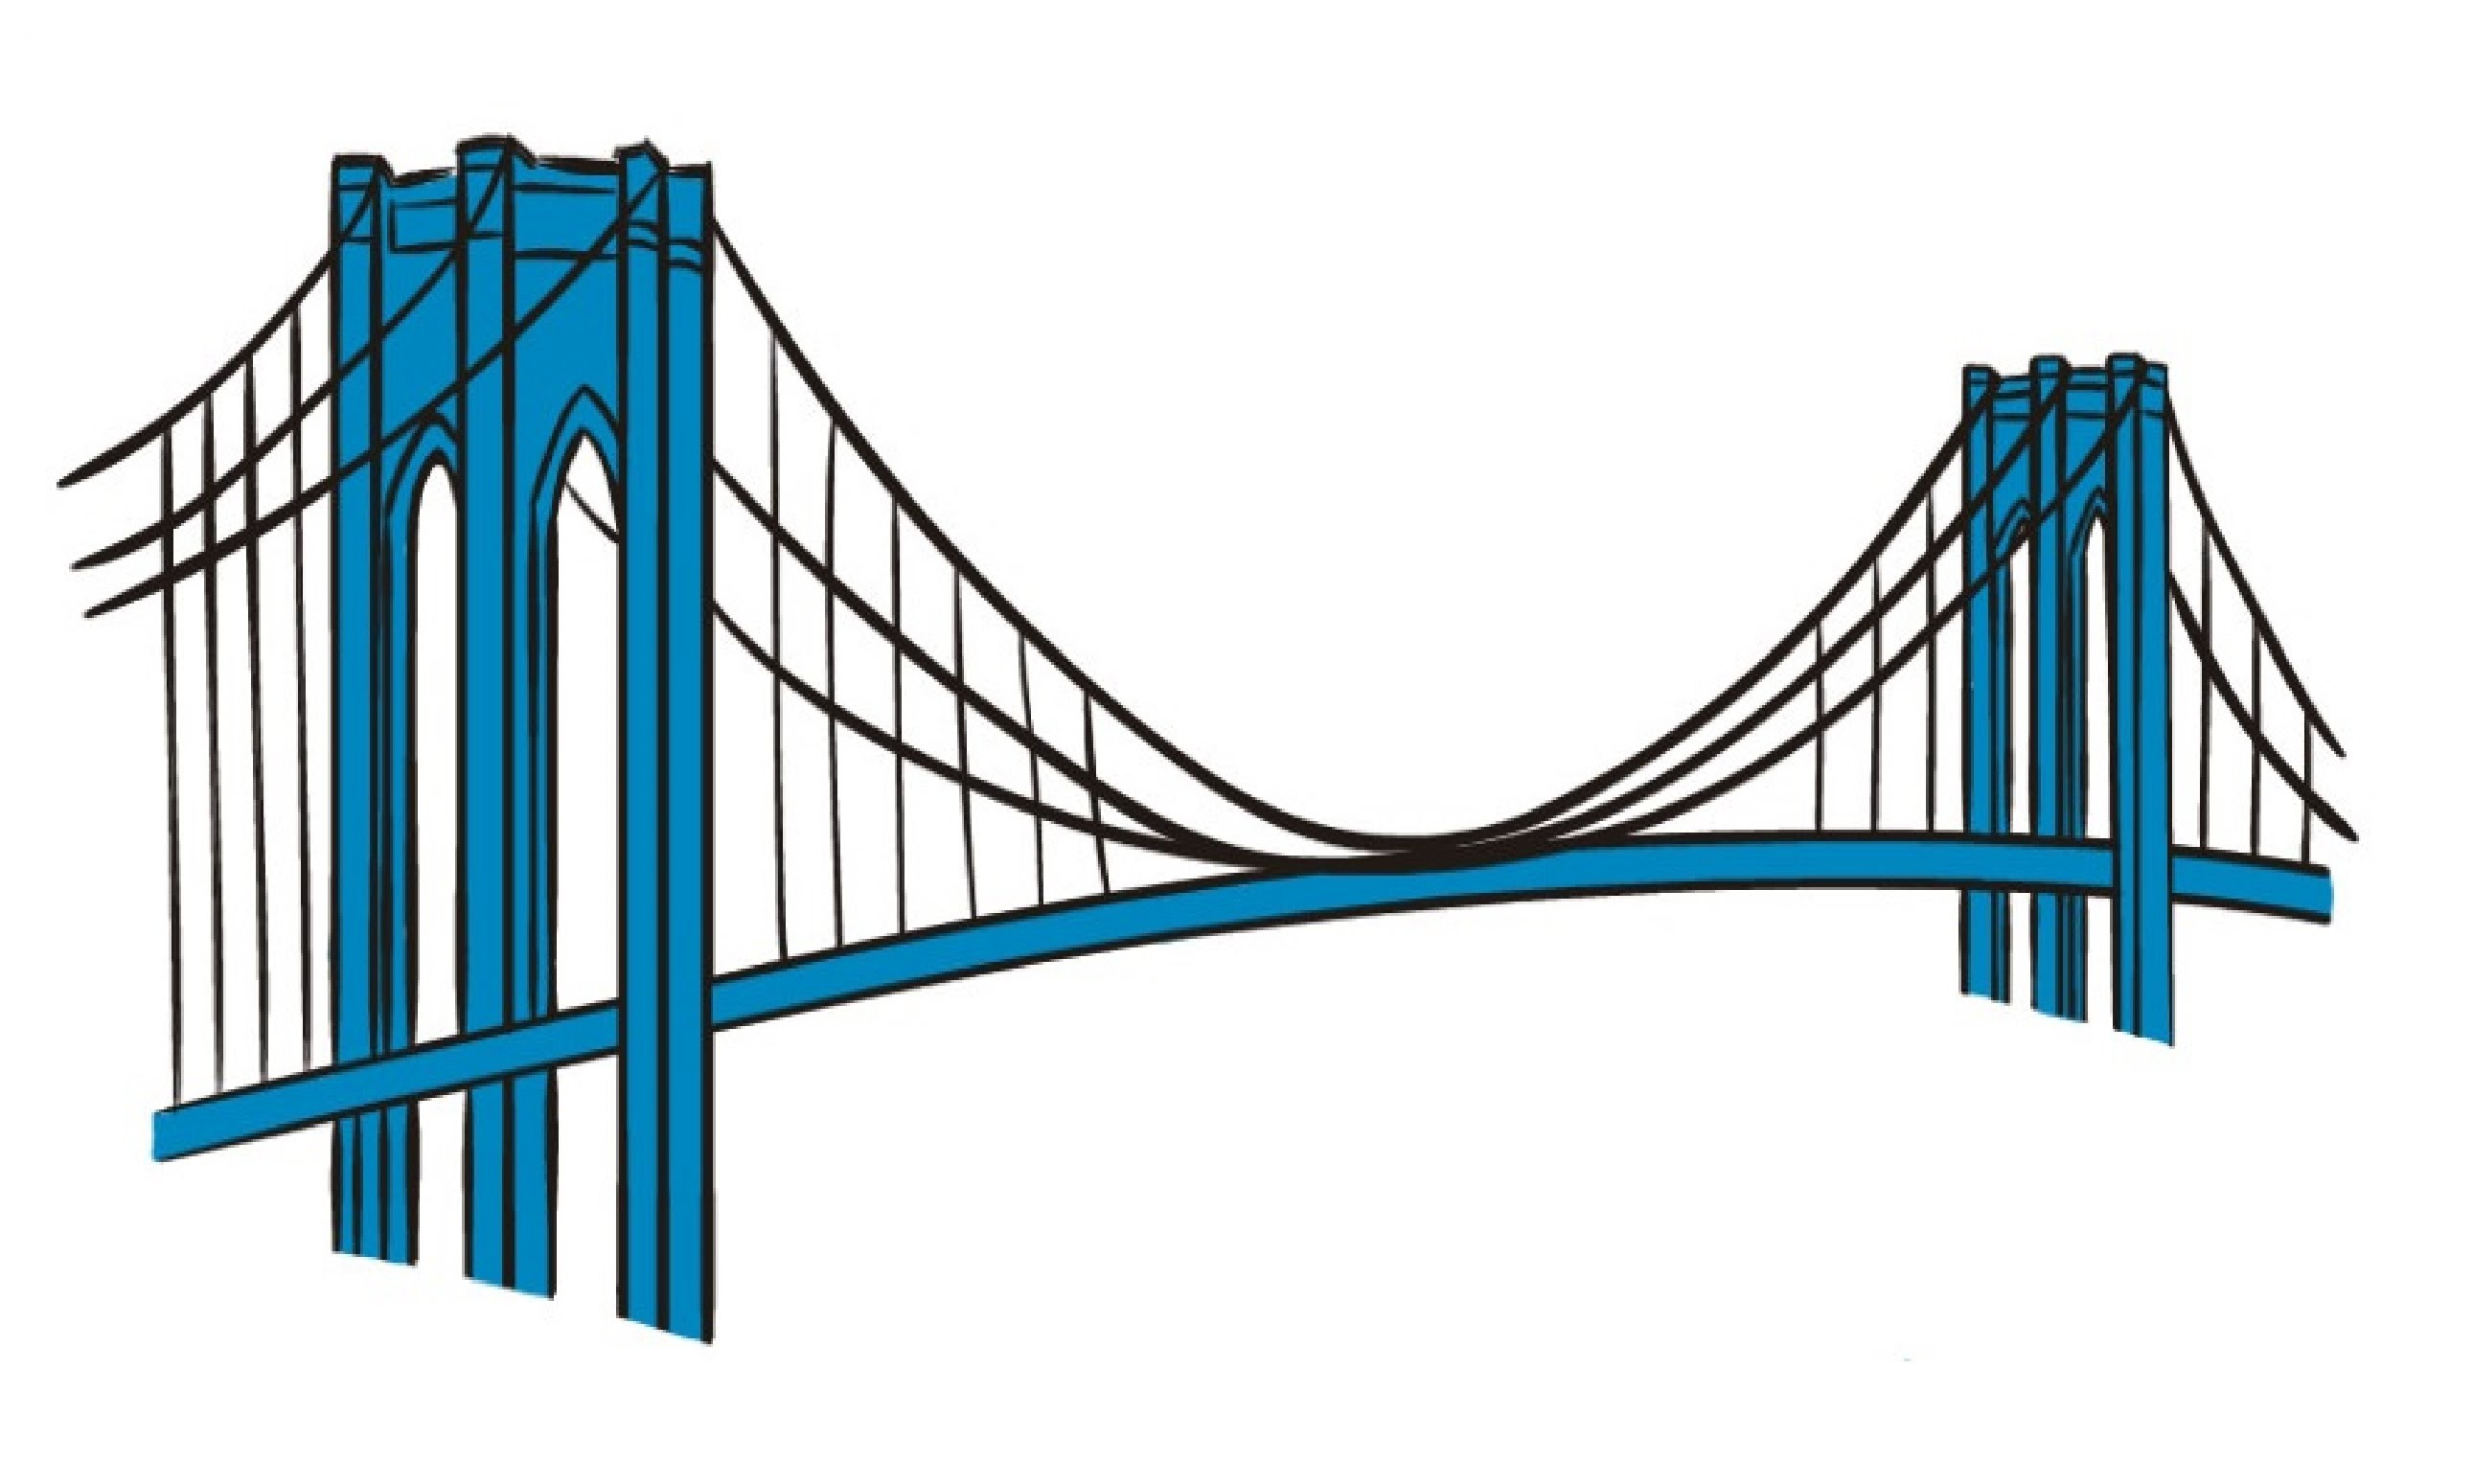 2581x1549 How To Draw A Brooklyn Bridge